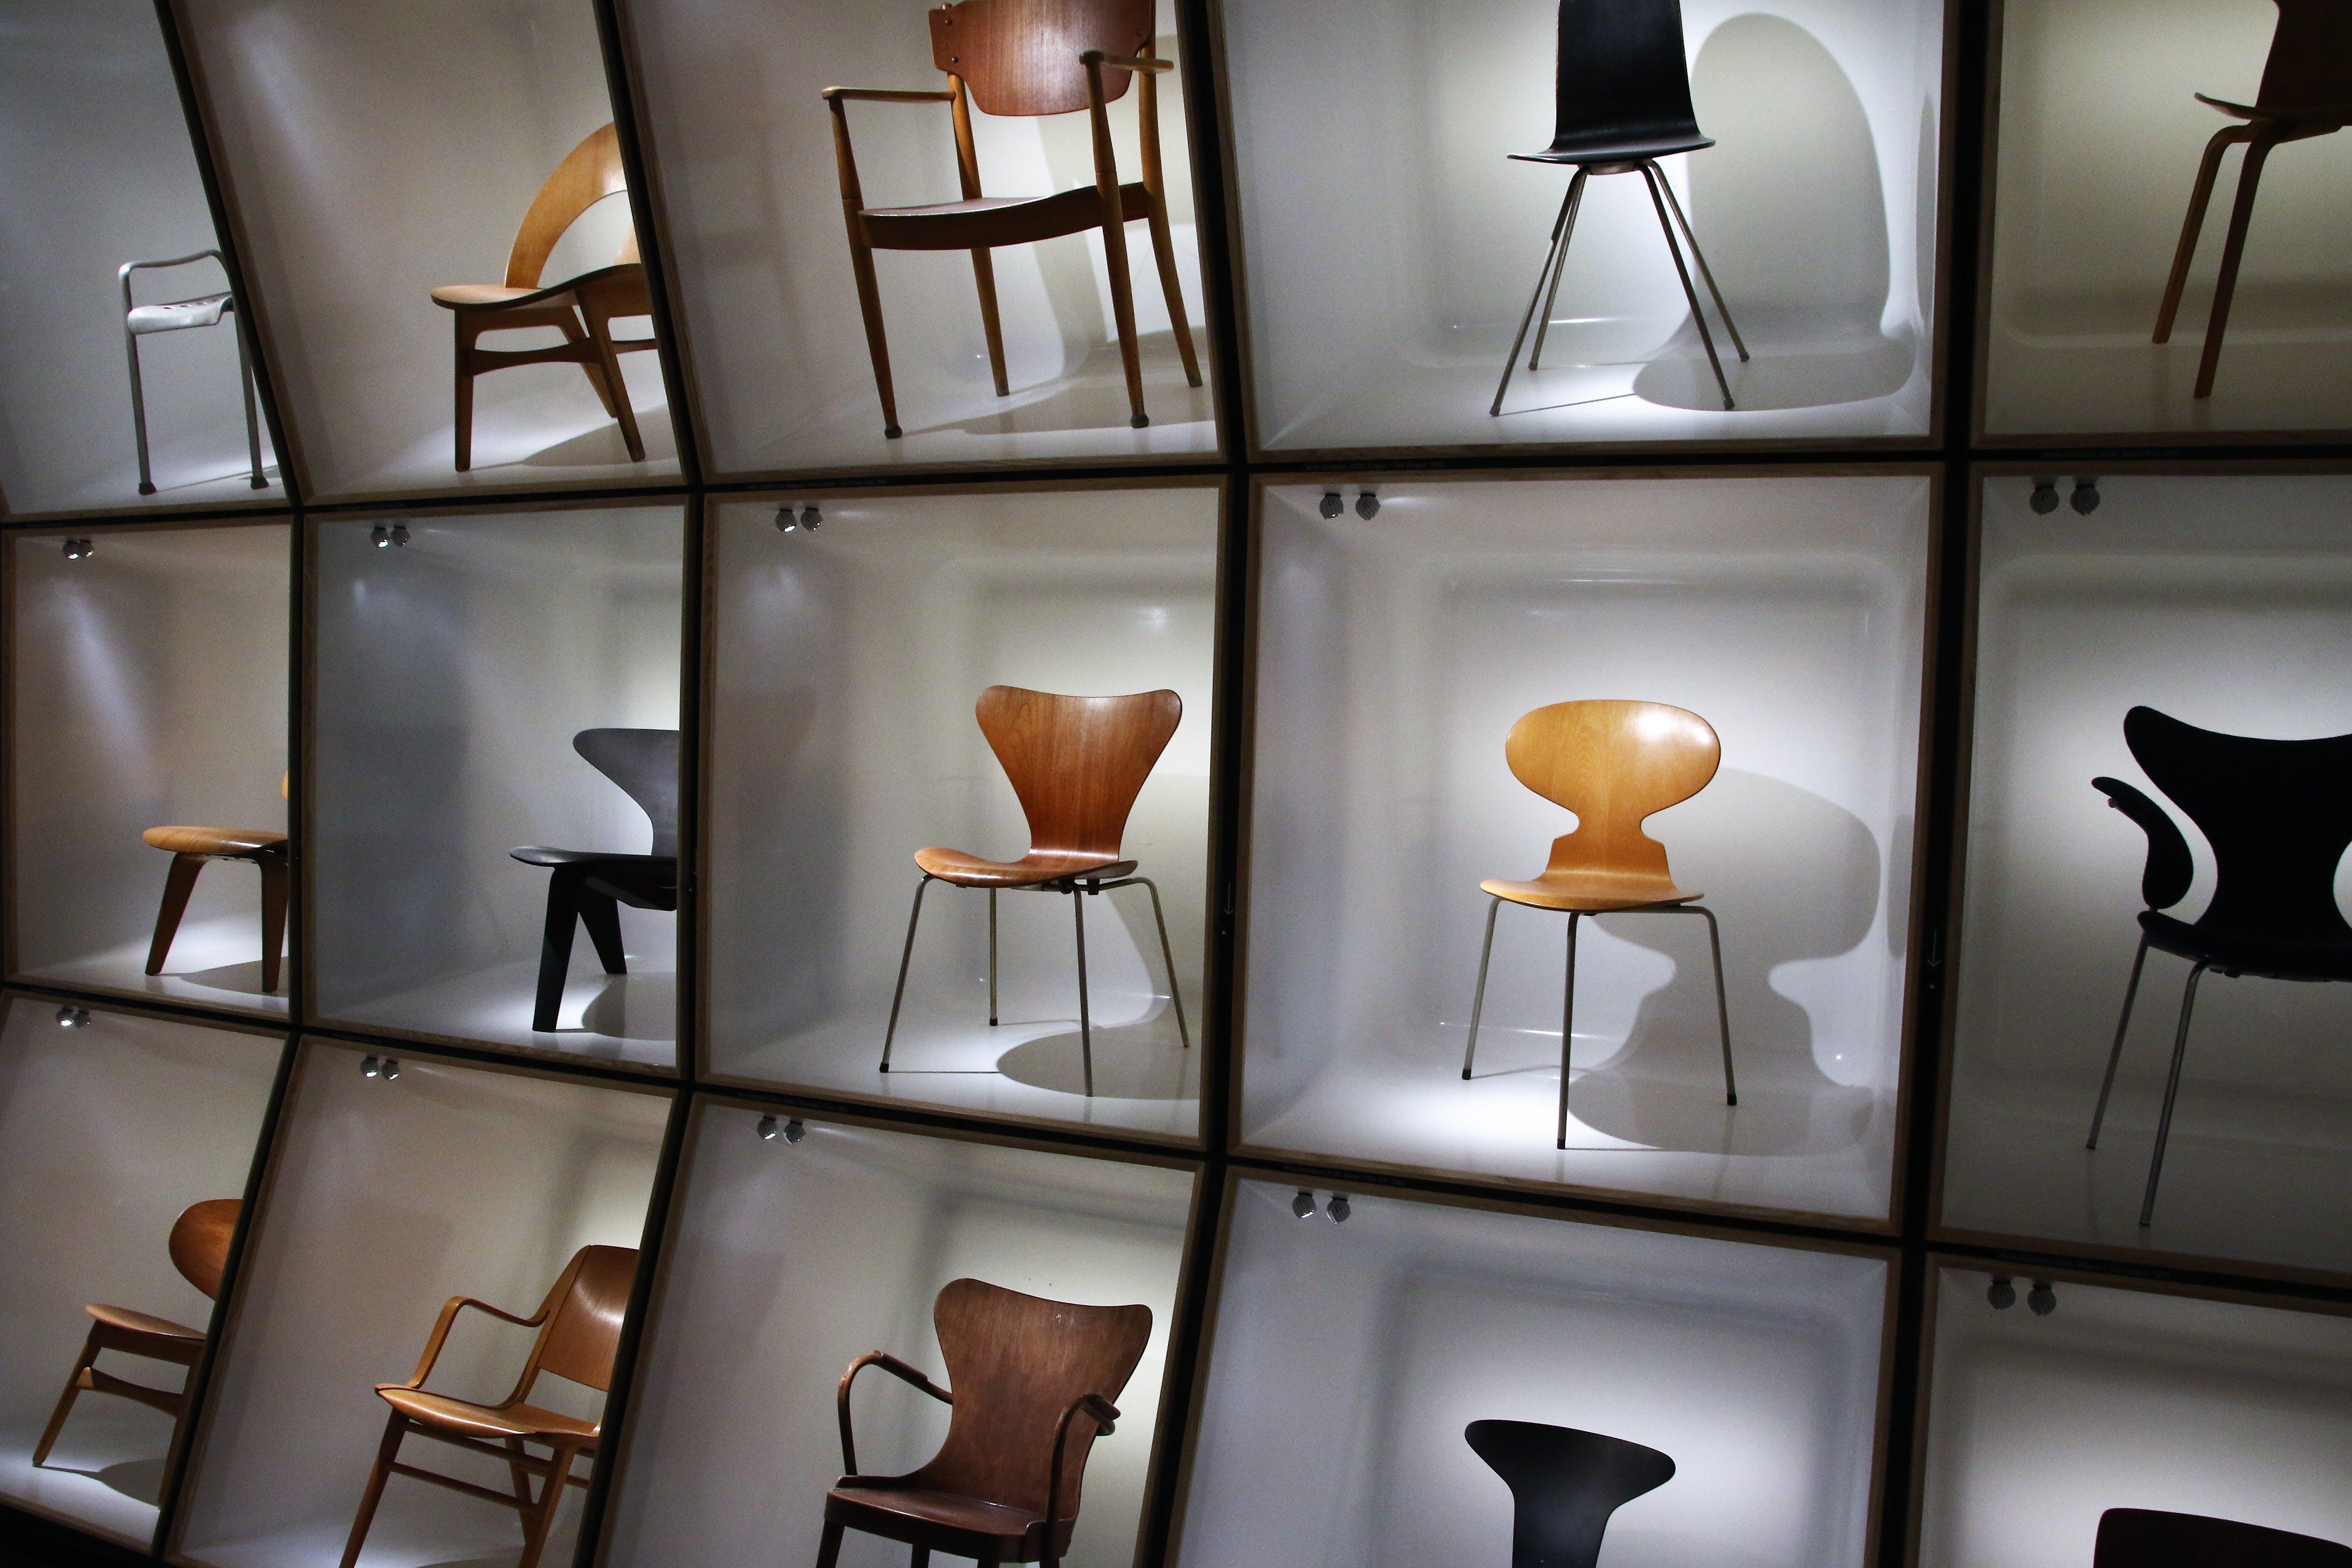 Free stock photo of wood, art, display, chairs